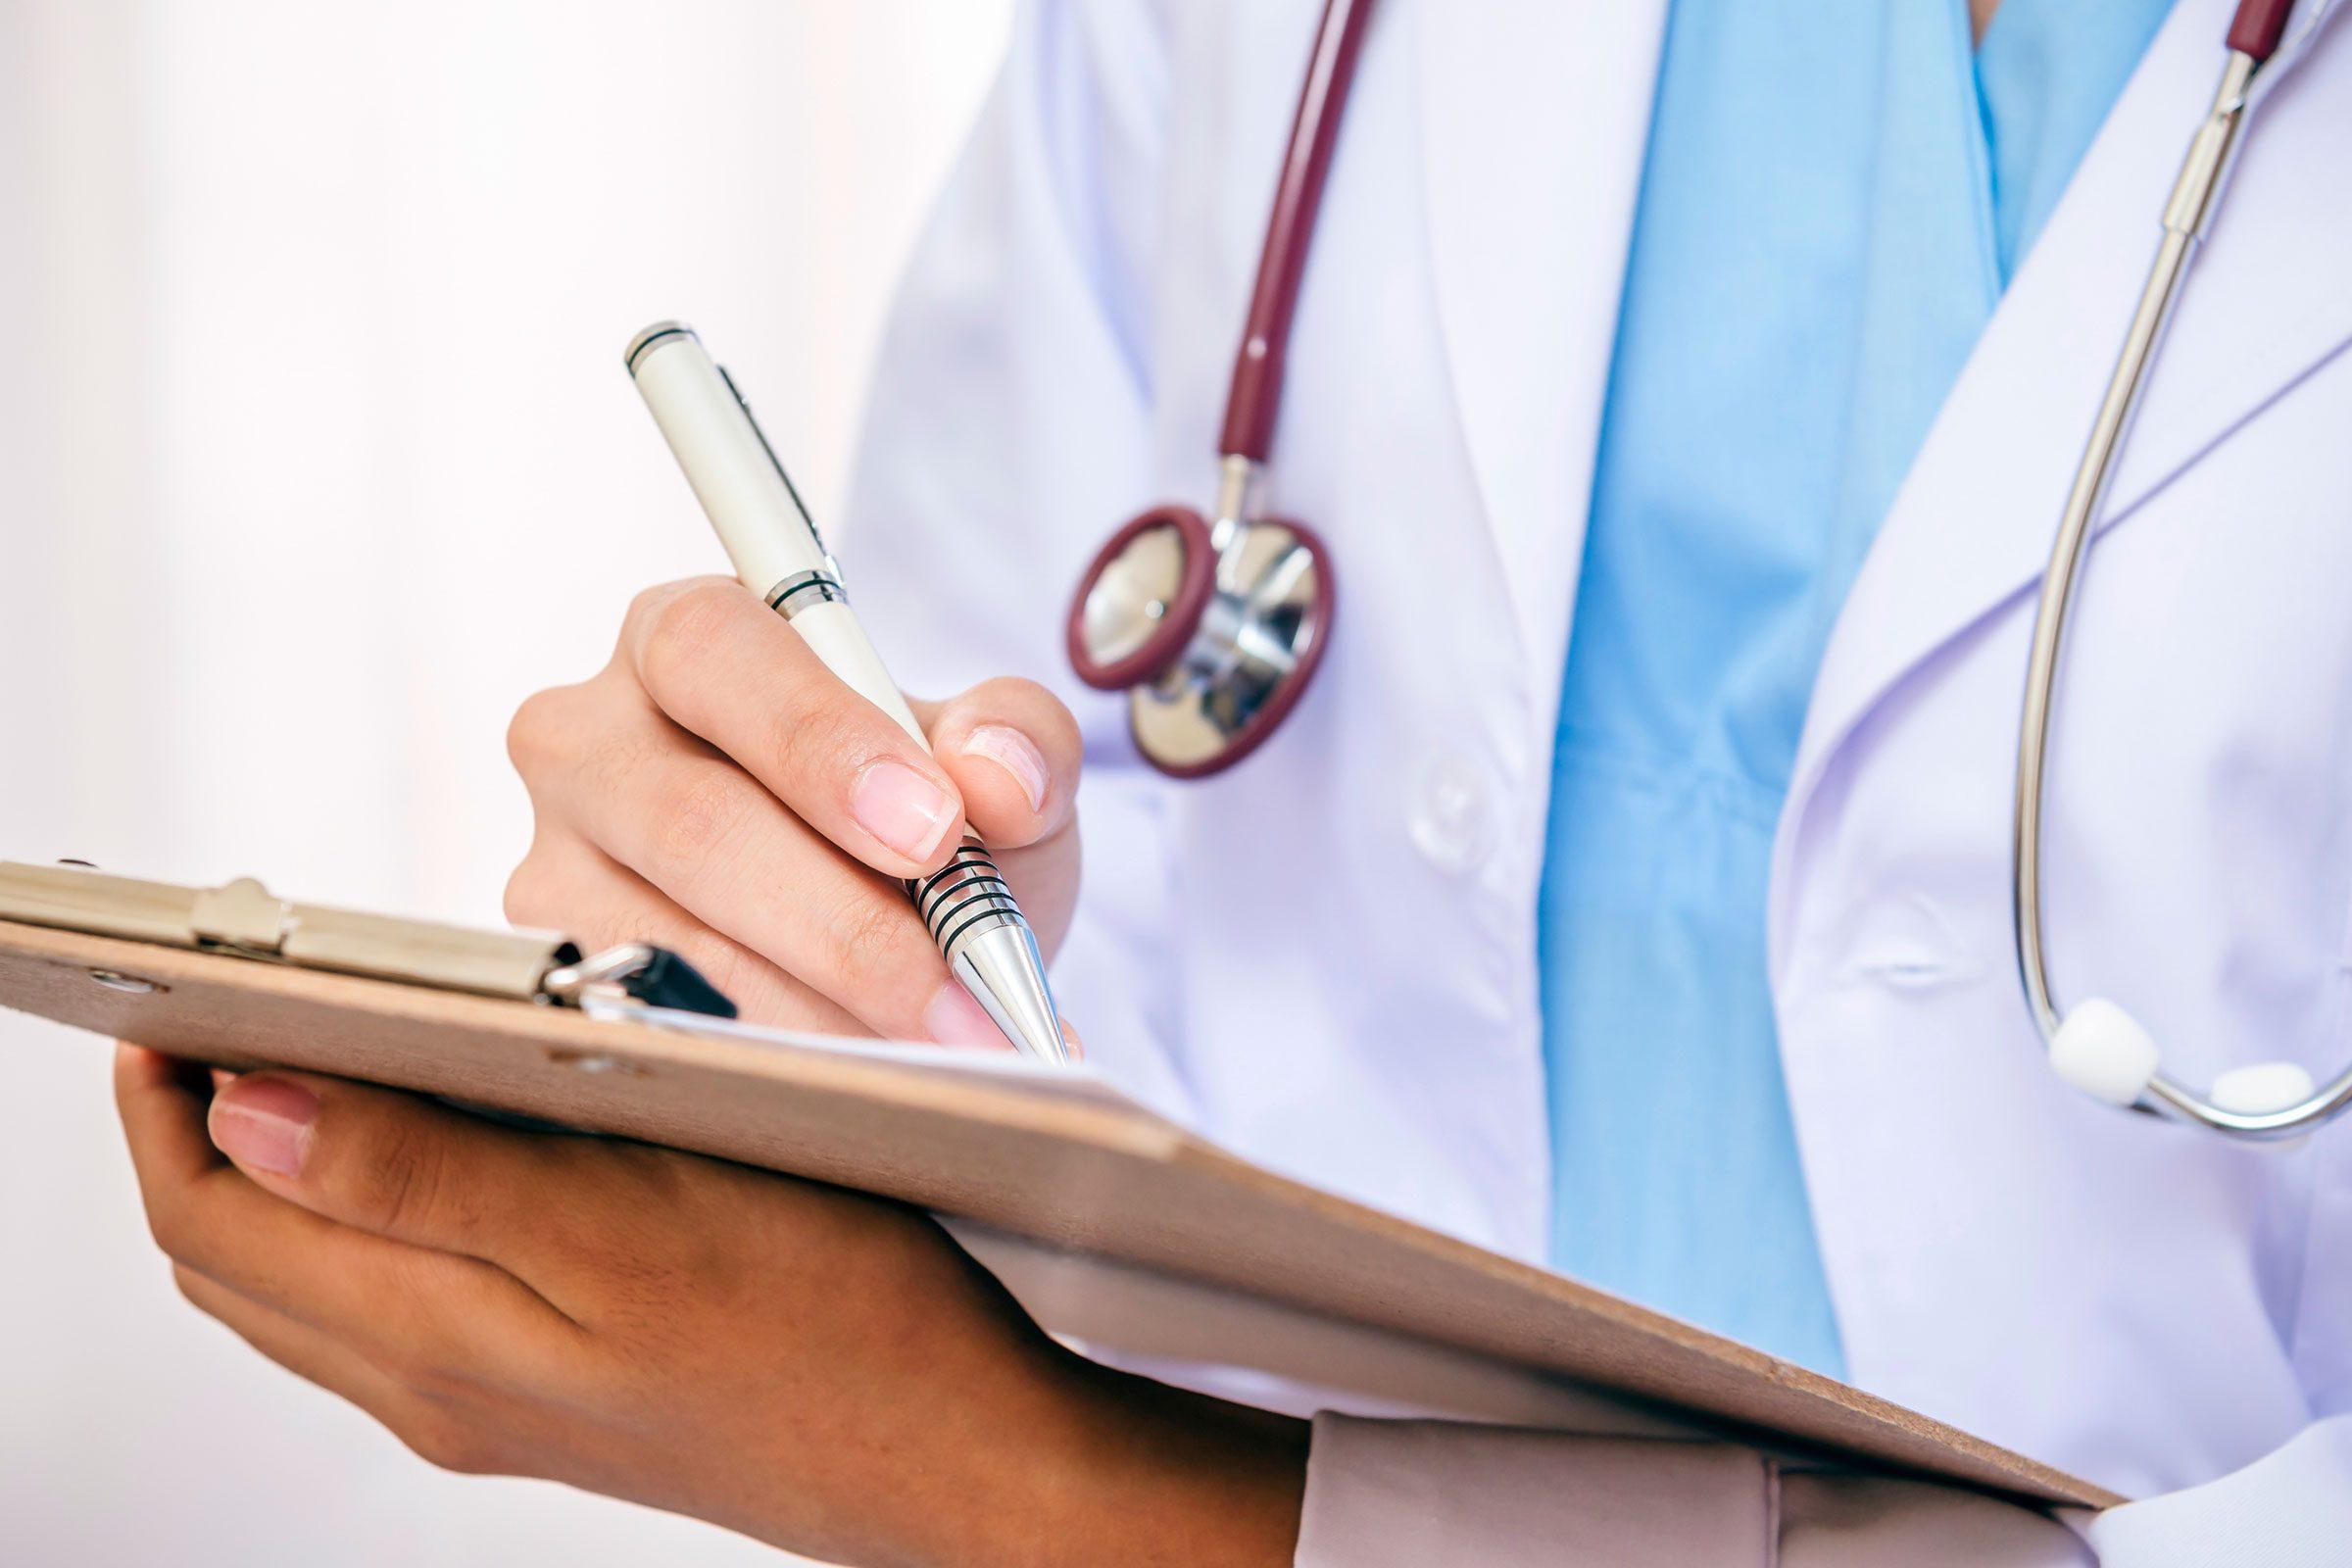 weight loss prescription drugs ukraine